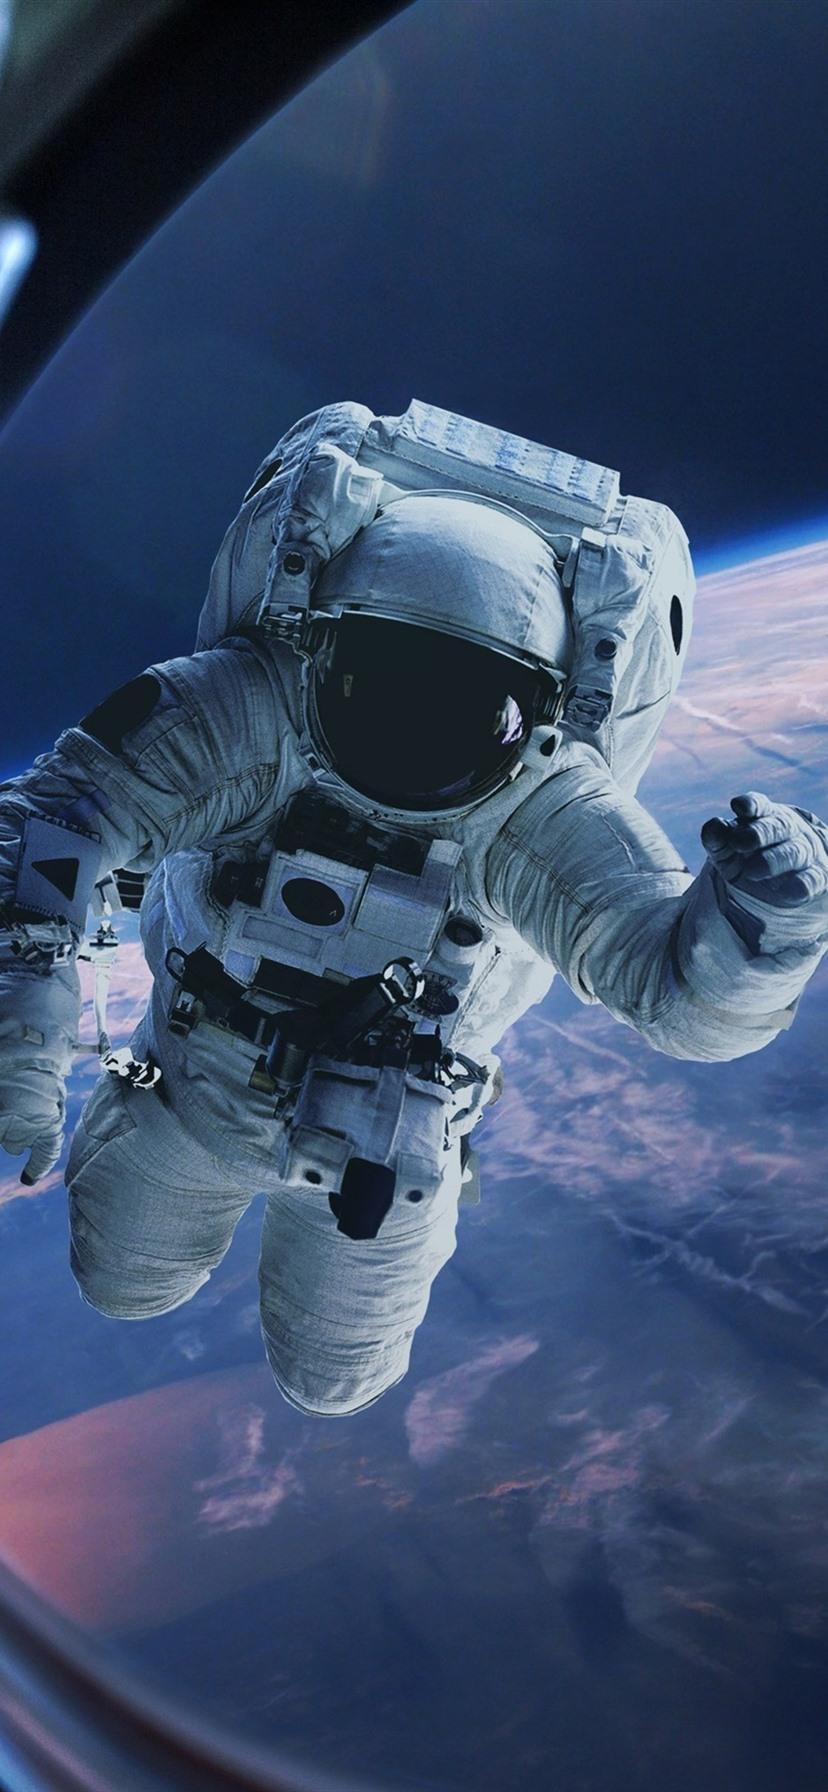 Astronaut erde fenster schwerkraft raum 3840x2160 uhd - Space wallpaper net ...